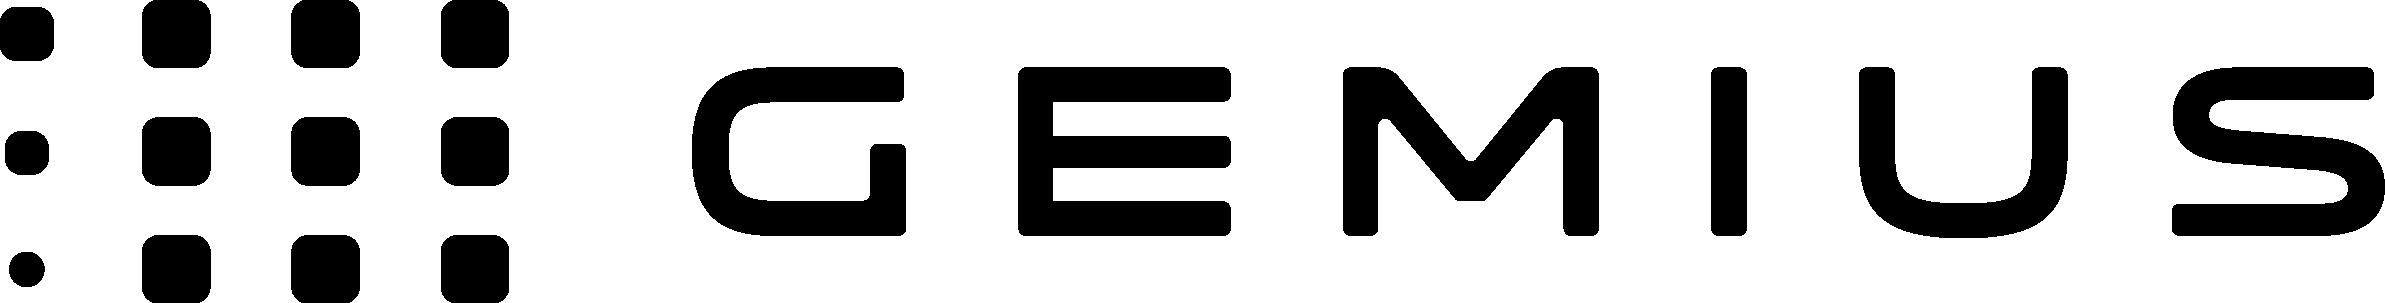 Netpanel Gemius Latvia